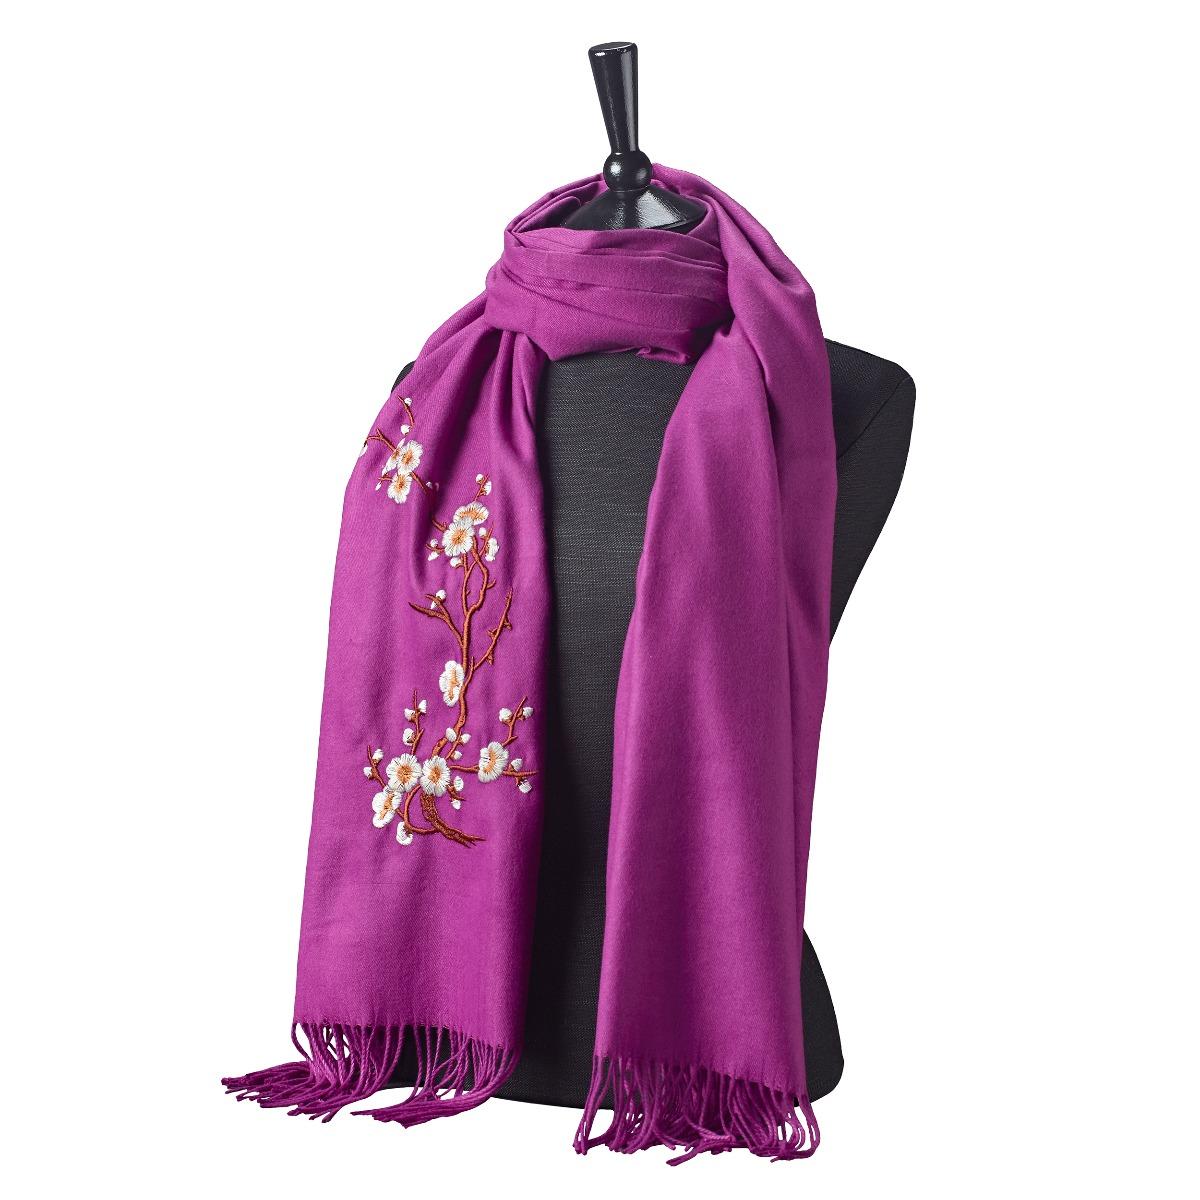 Cherry blossom scarf (purple)